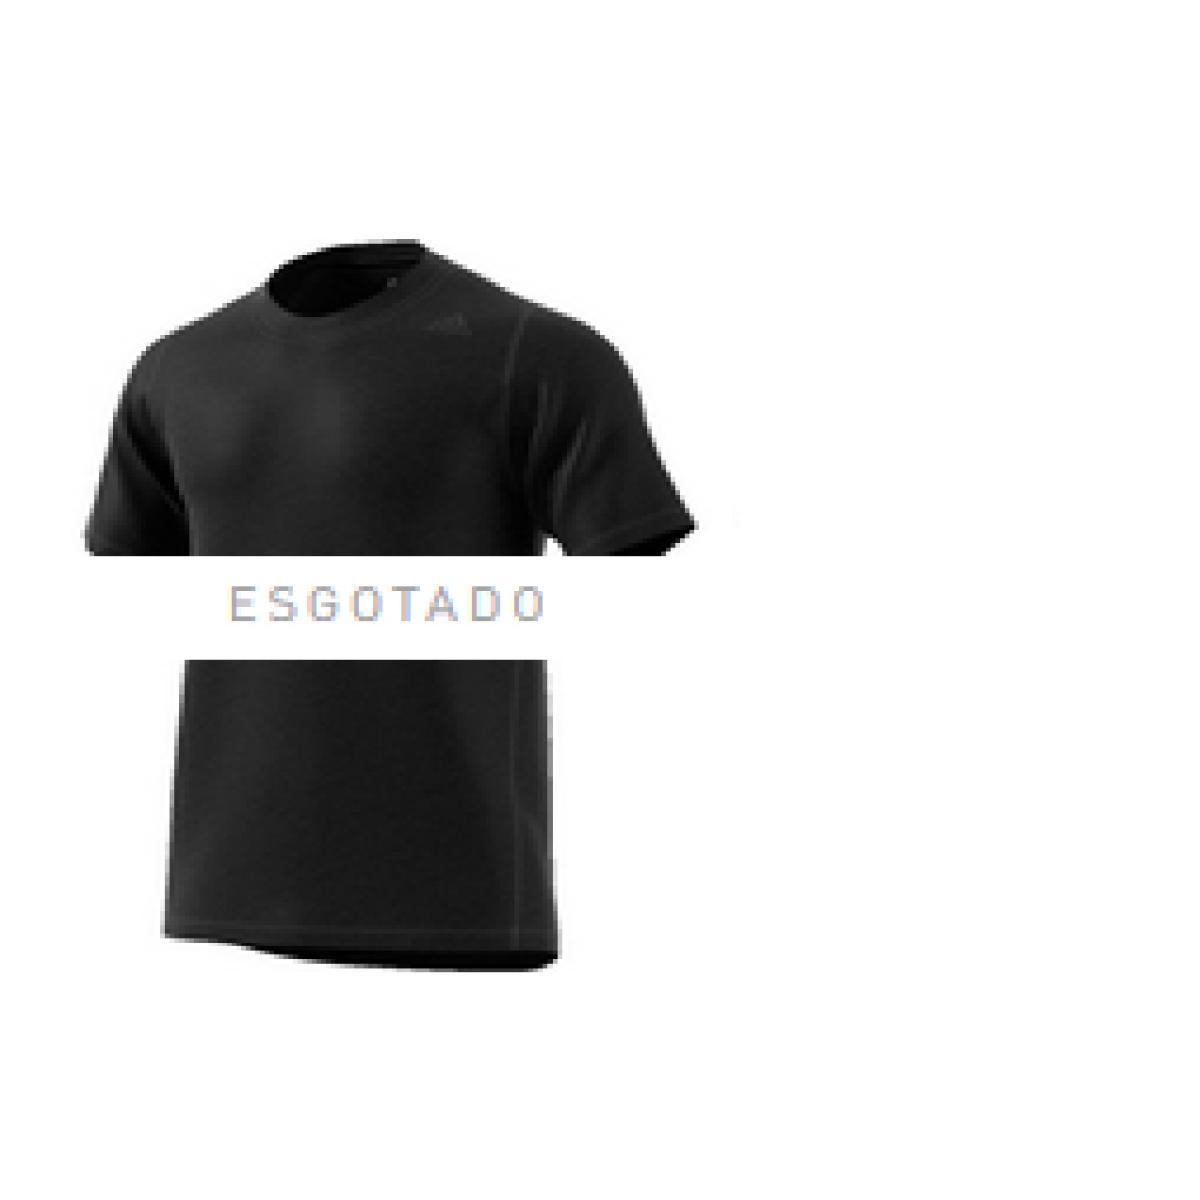 Camiseta Masculina Adidas Dx9505 Fltec z ft Cco m Preto